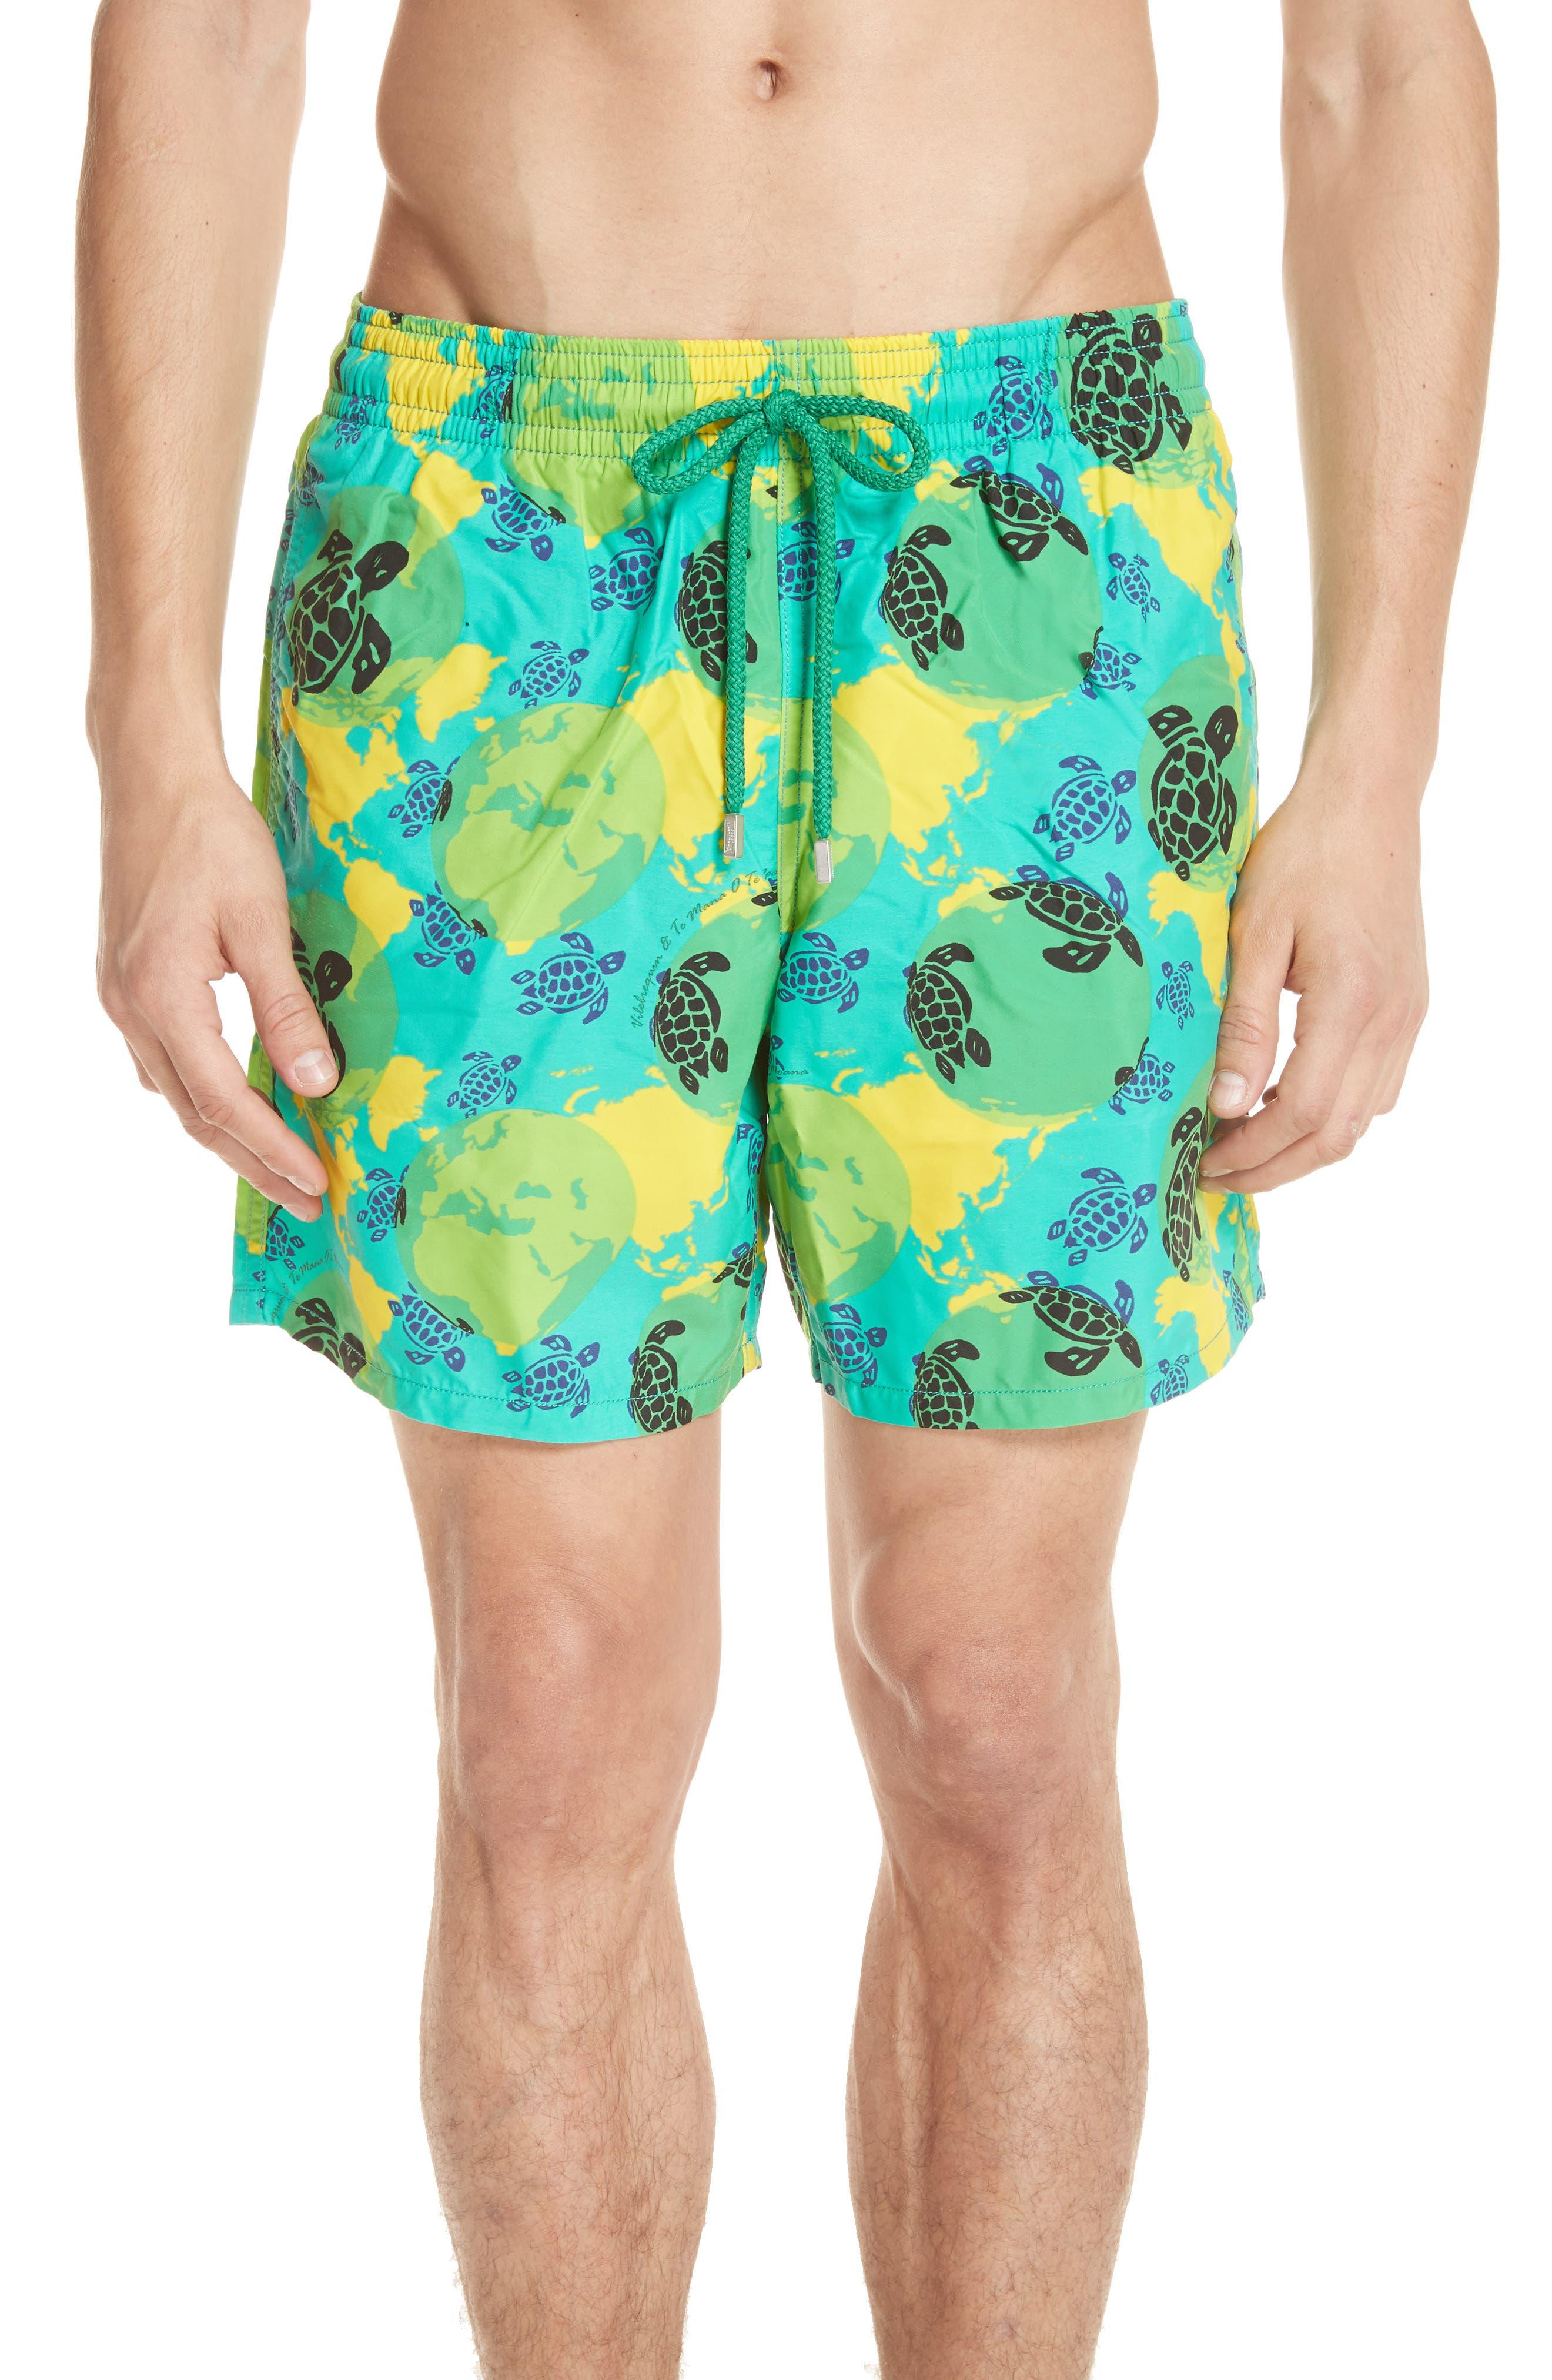 Eco Turtle Print Swim Trunks,                         Main,                         color, VERONESE GREEN